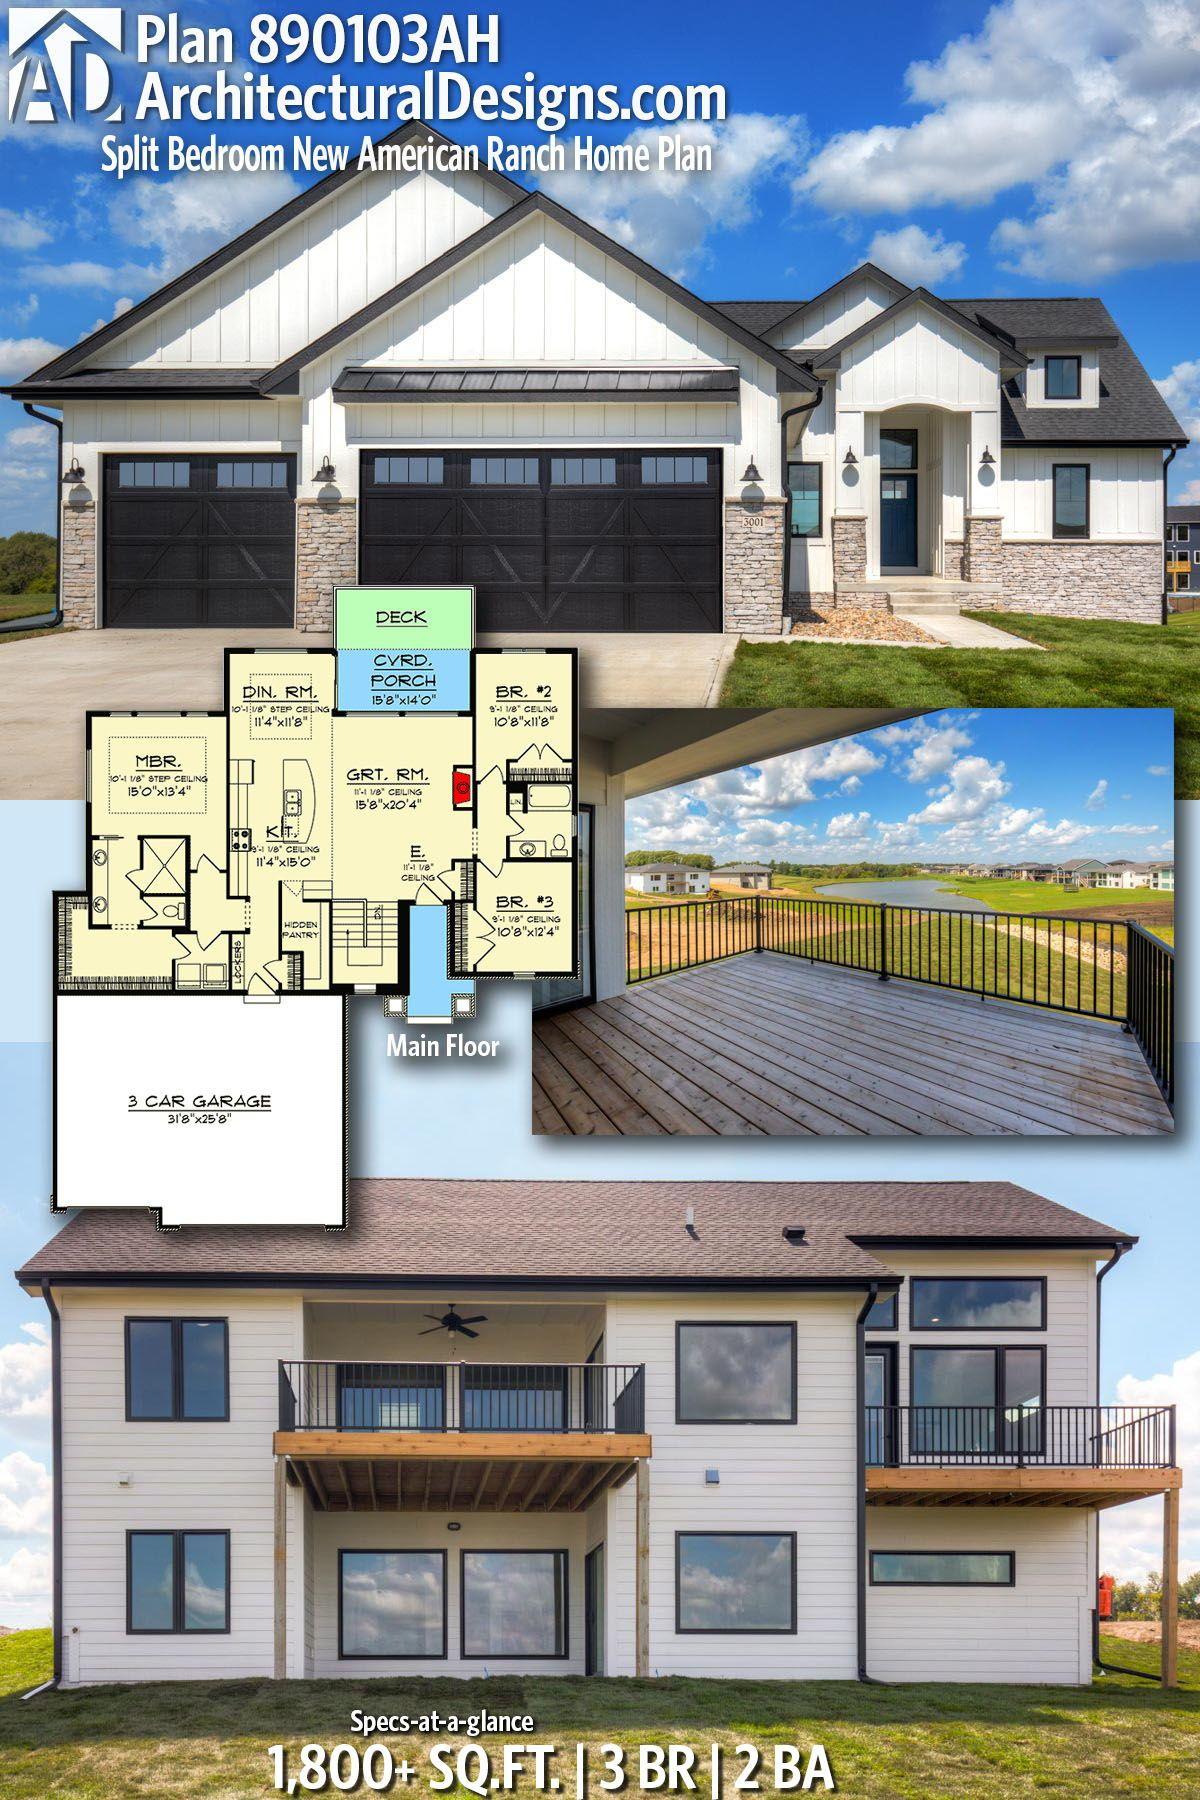 Plan 890103ah Split Bedroom American Ranch Home